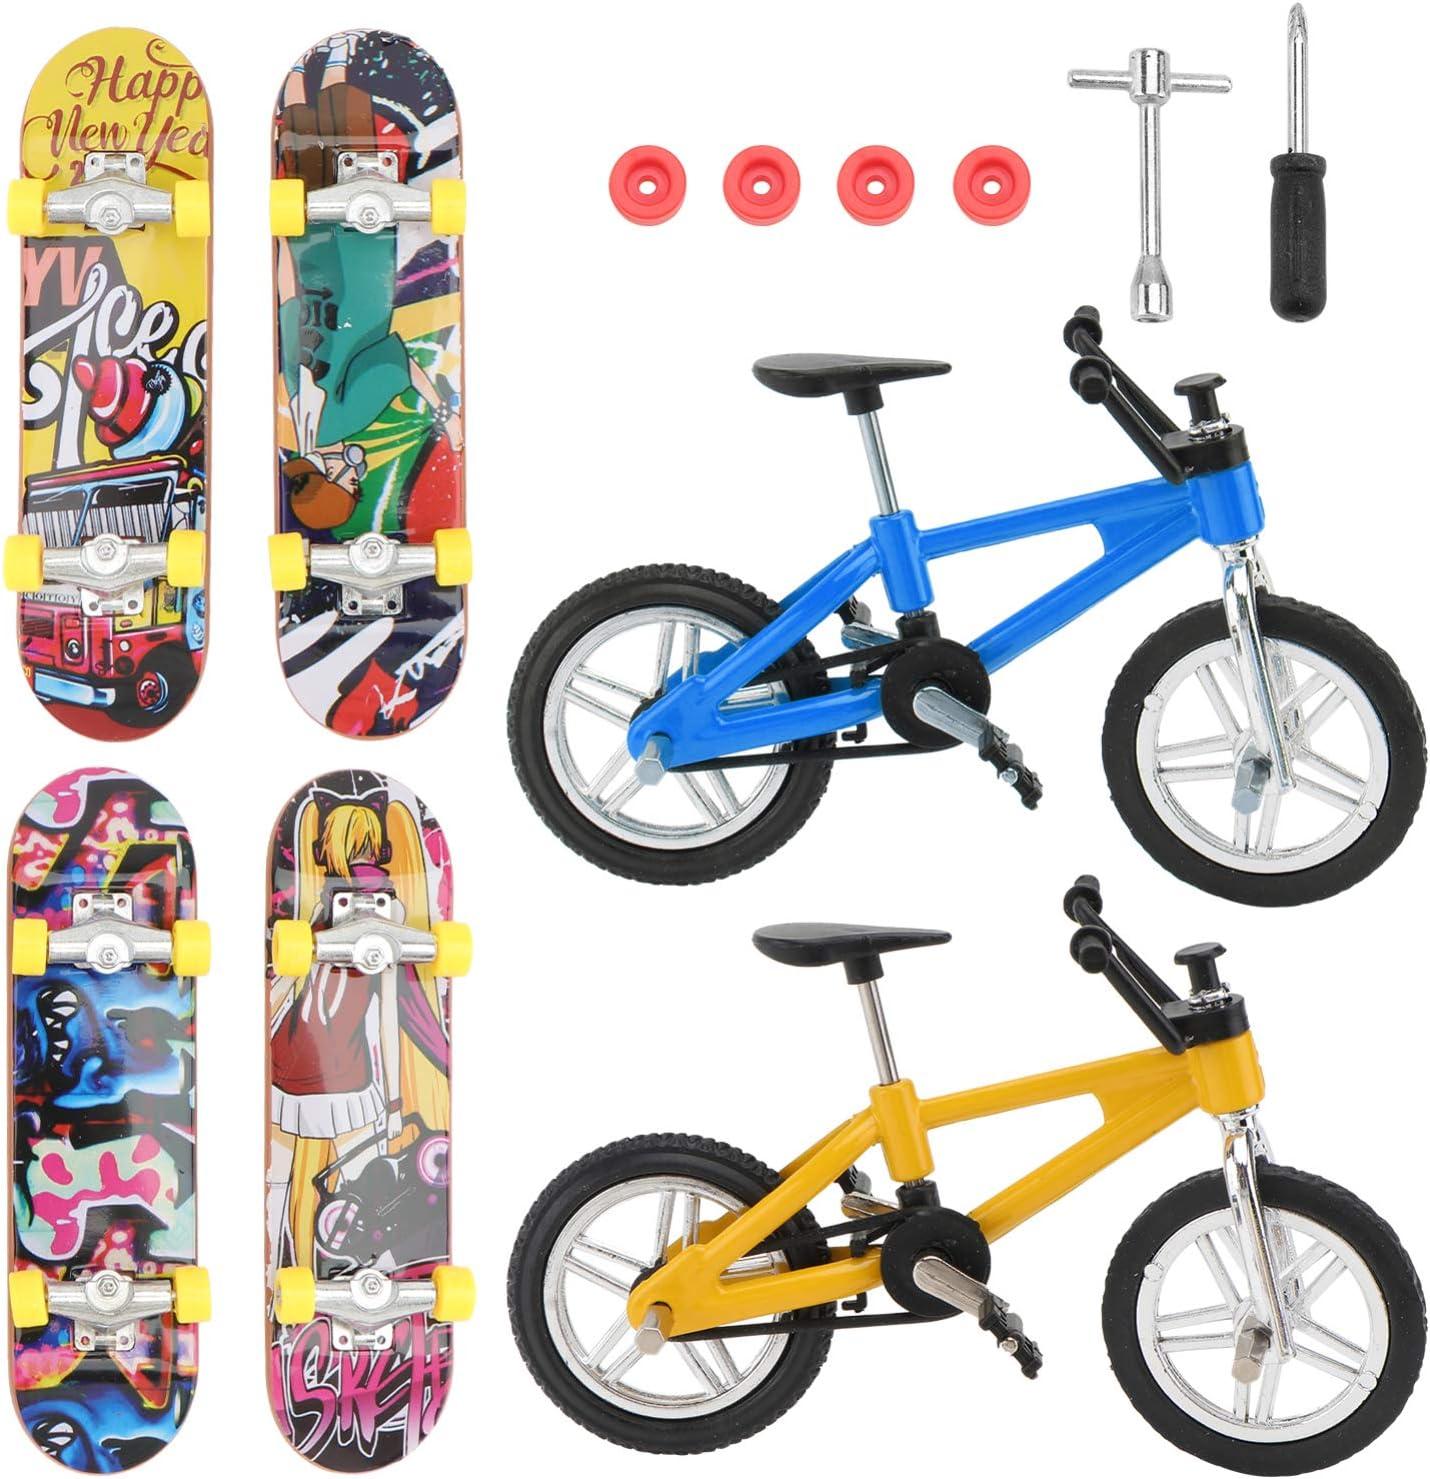 NUOBESTY Mini Finger Toys Bikes Charlotte Mall Skateboards Set Sl Sales